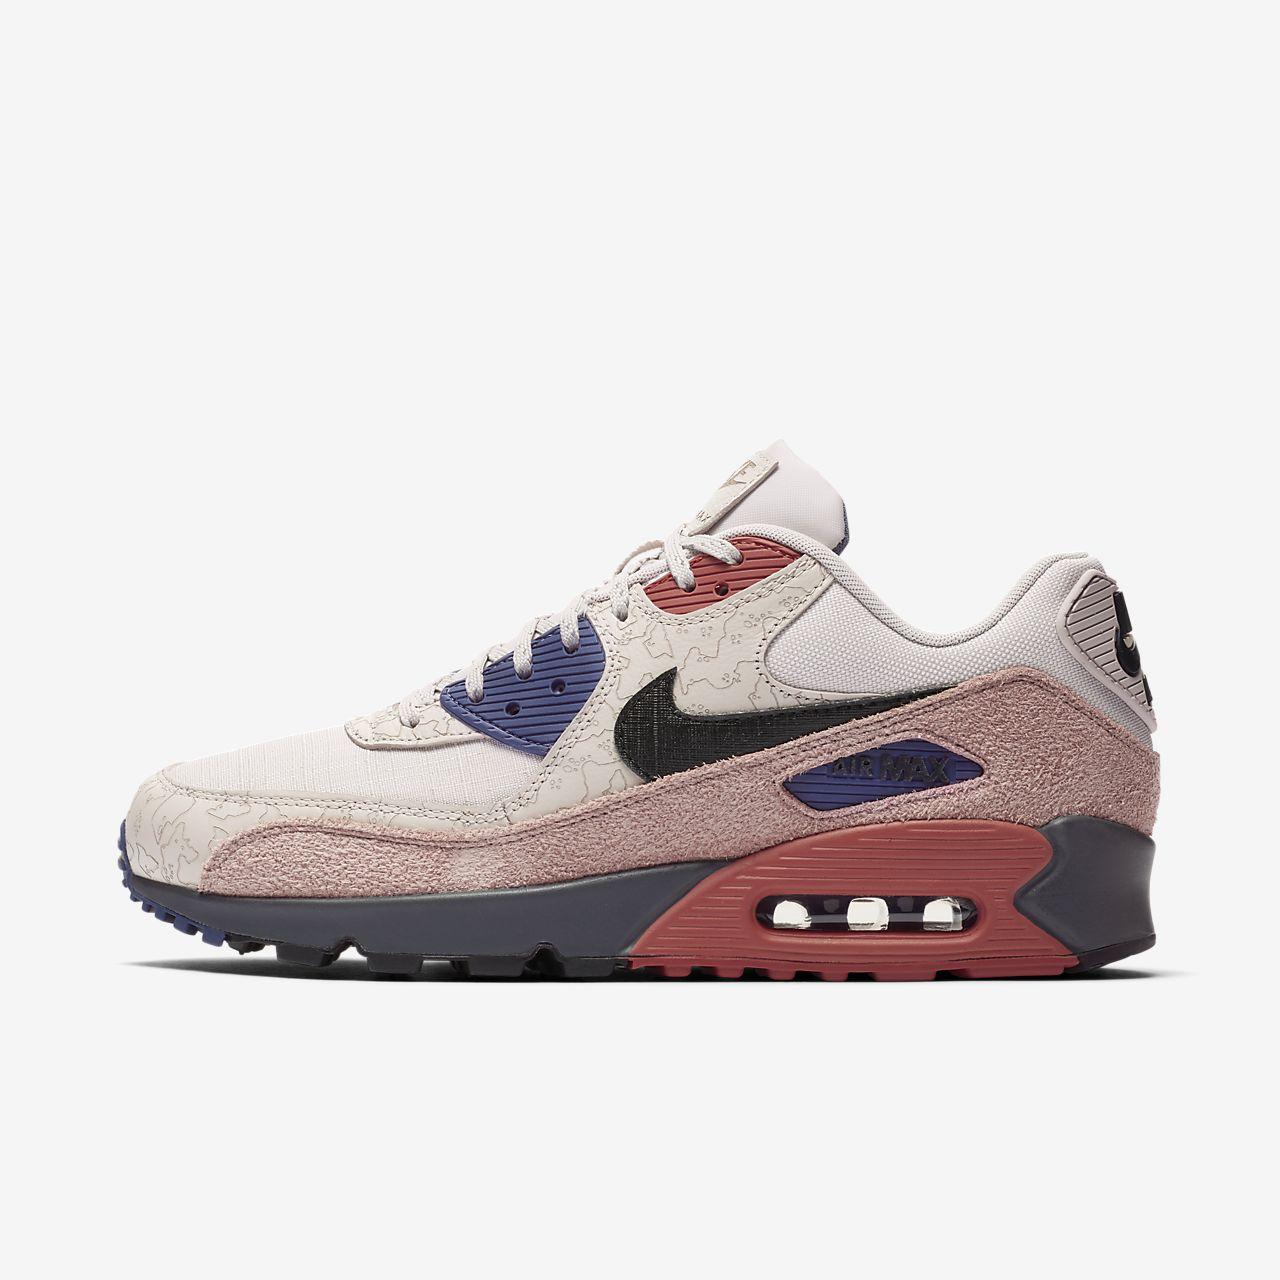 Nike Air Max 90 25th Anniversary Colorways Sneaker Bar